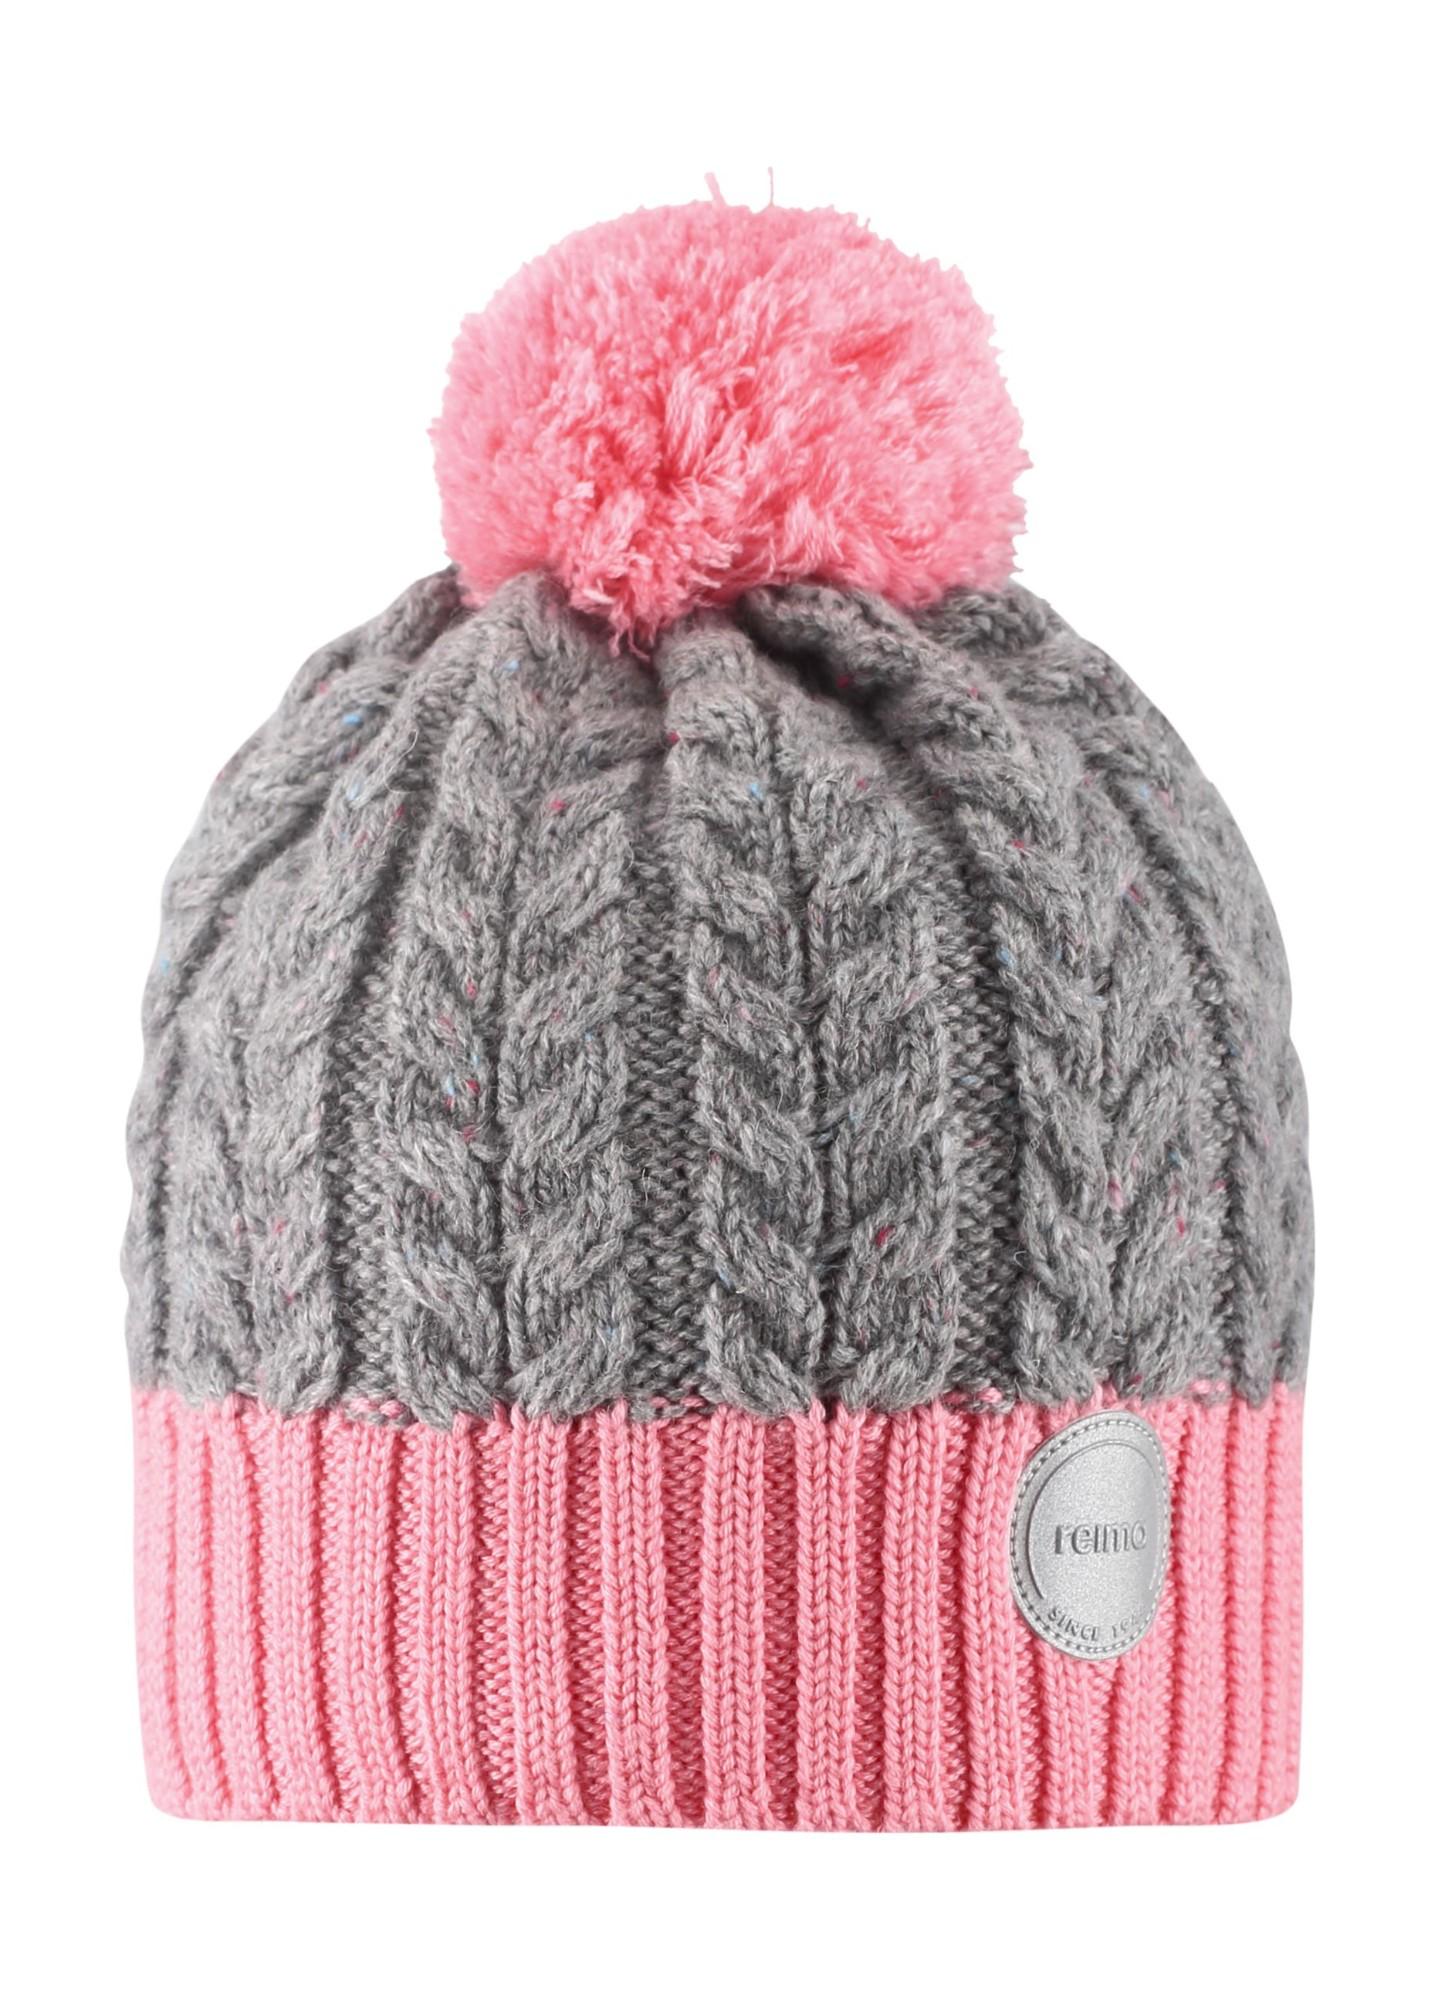 REIMA Pohjola 528674 Bubblegum Pink 48-50